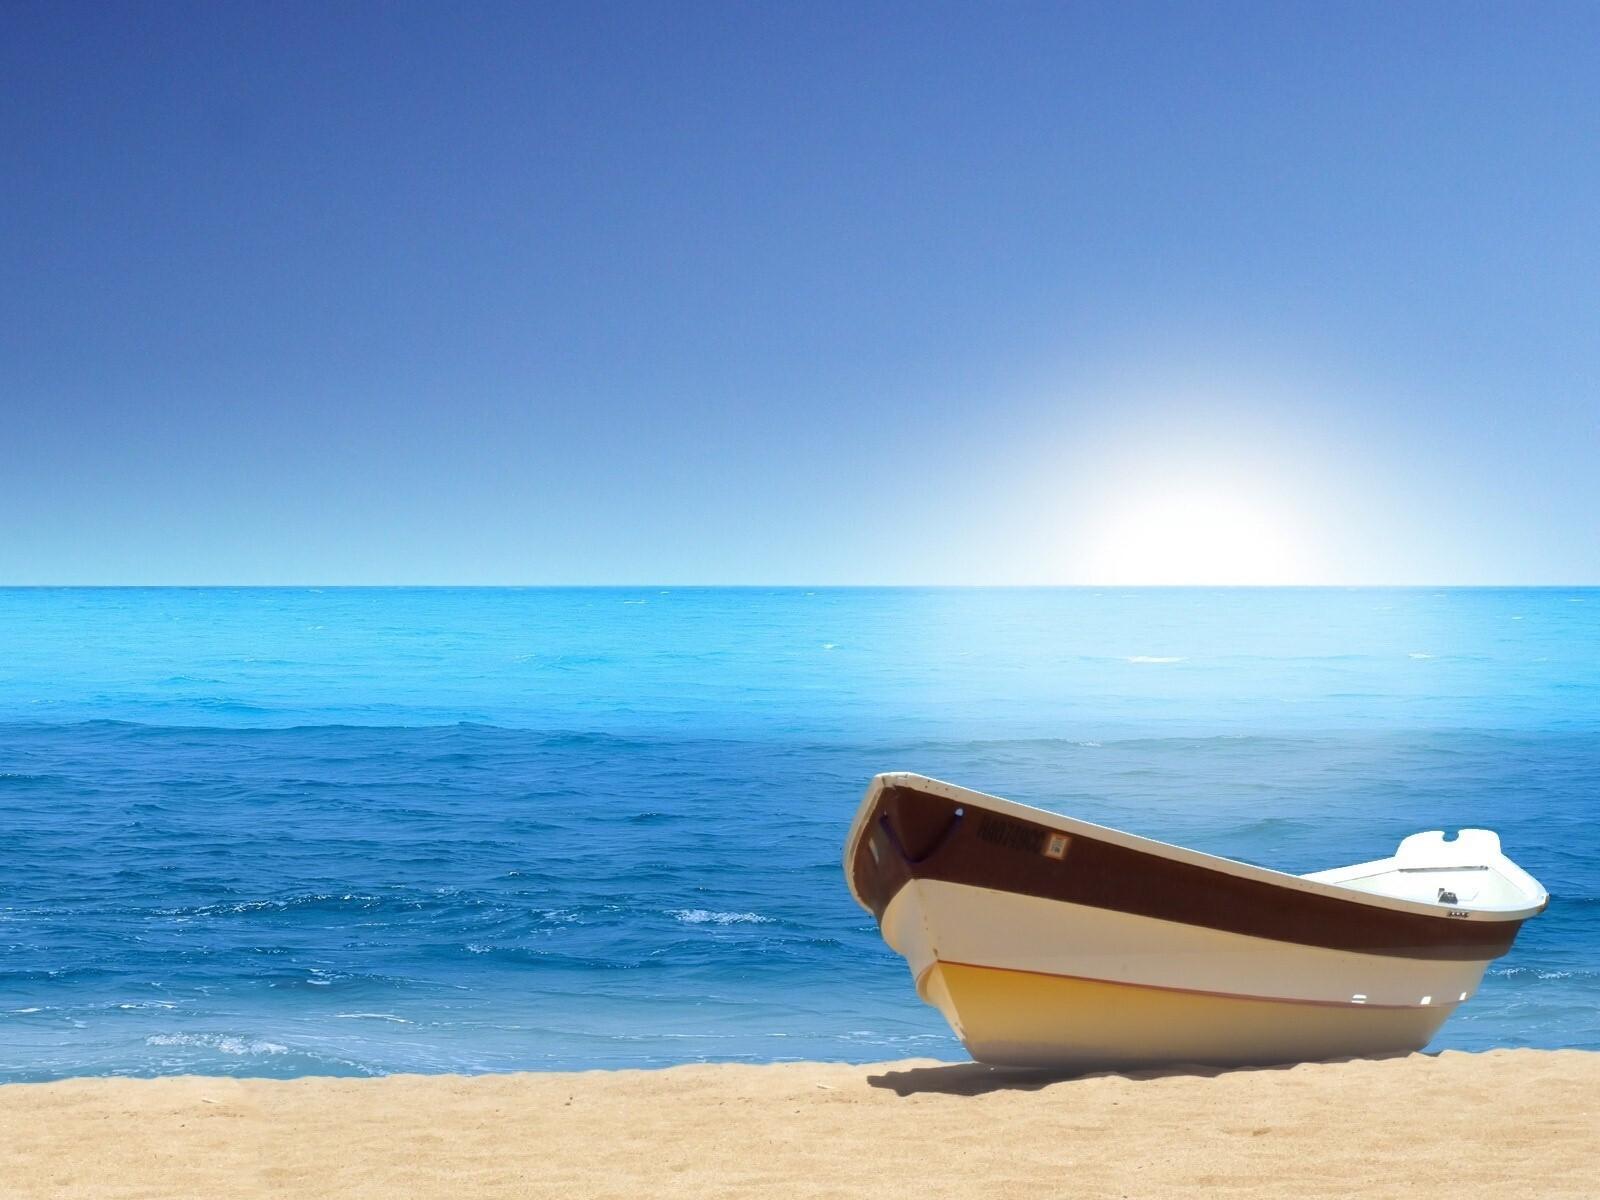 Boat At Blue Sea Beach Hd Wallpapers